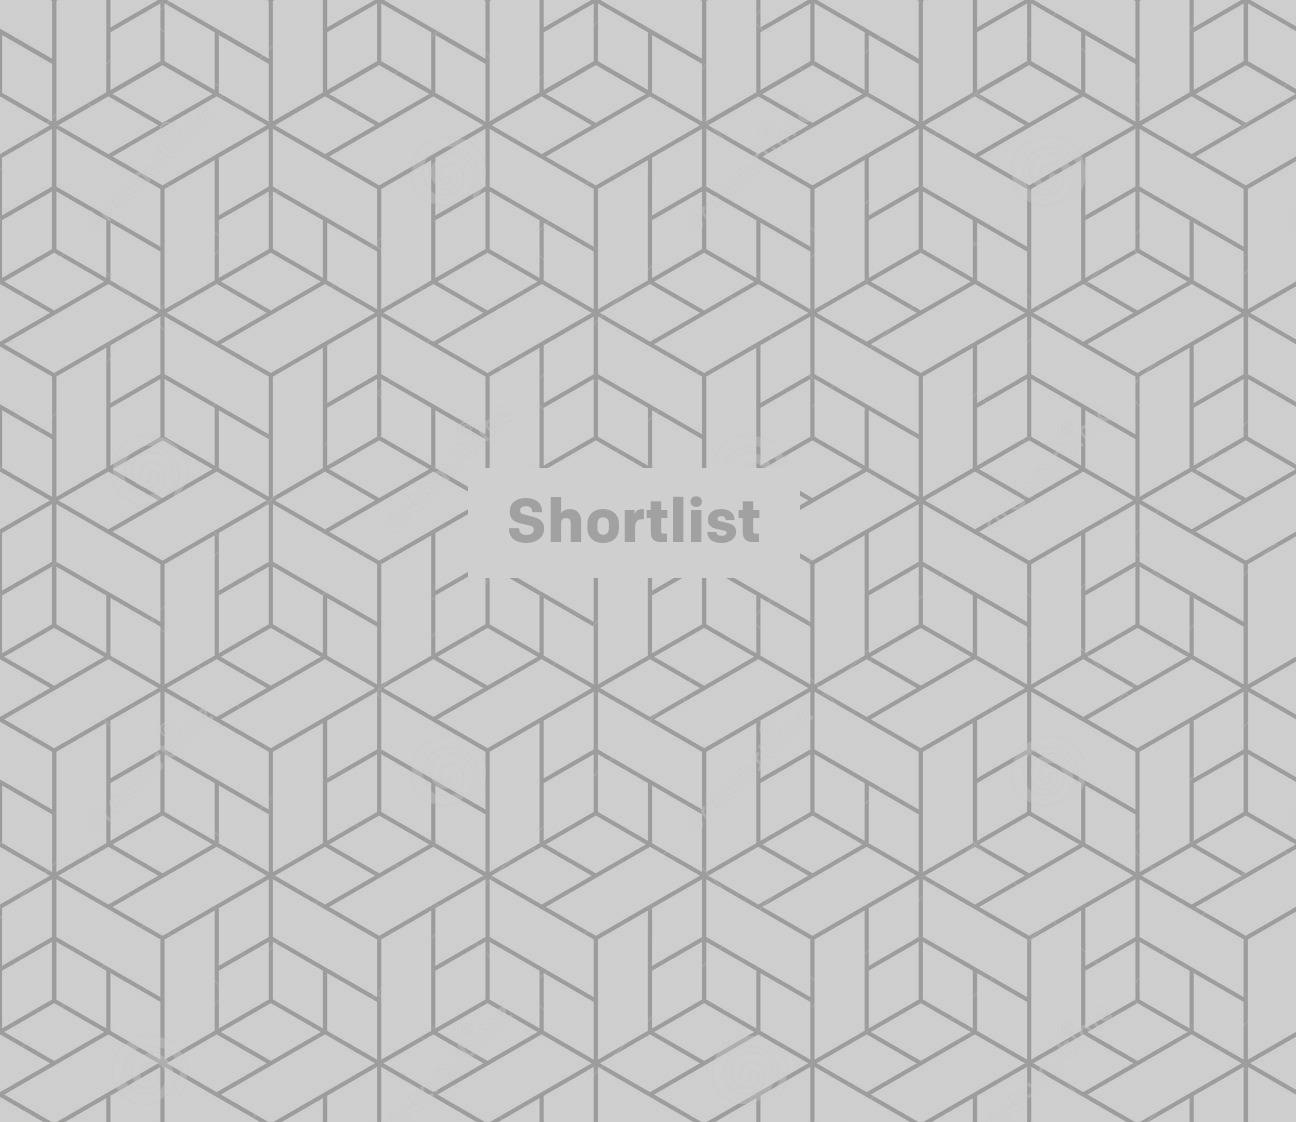 www.shortlist.com